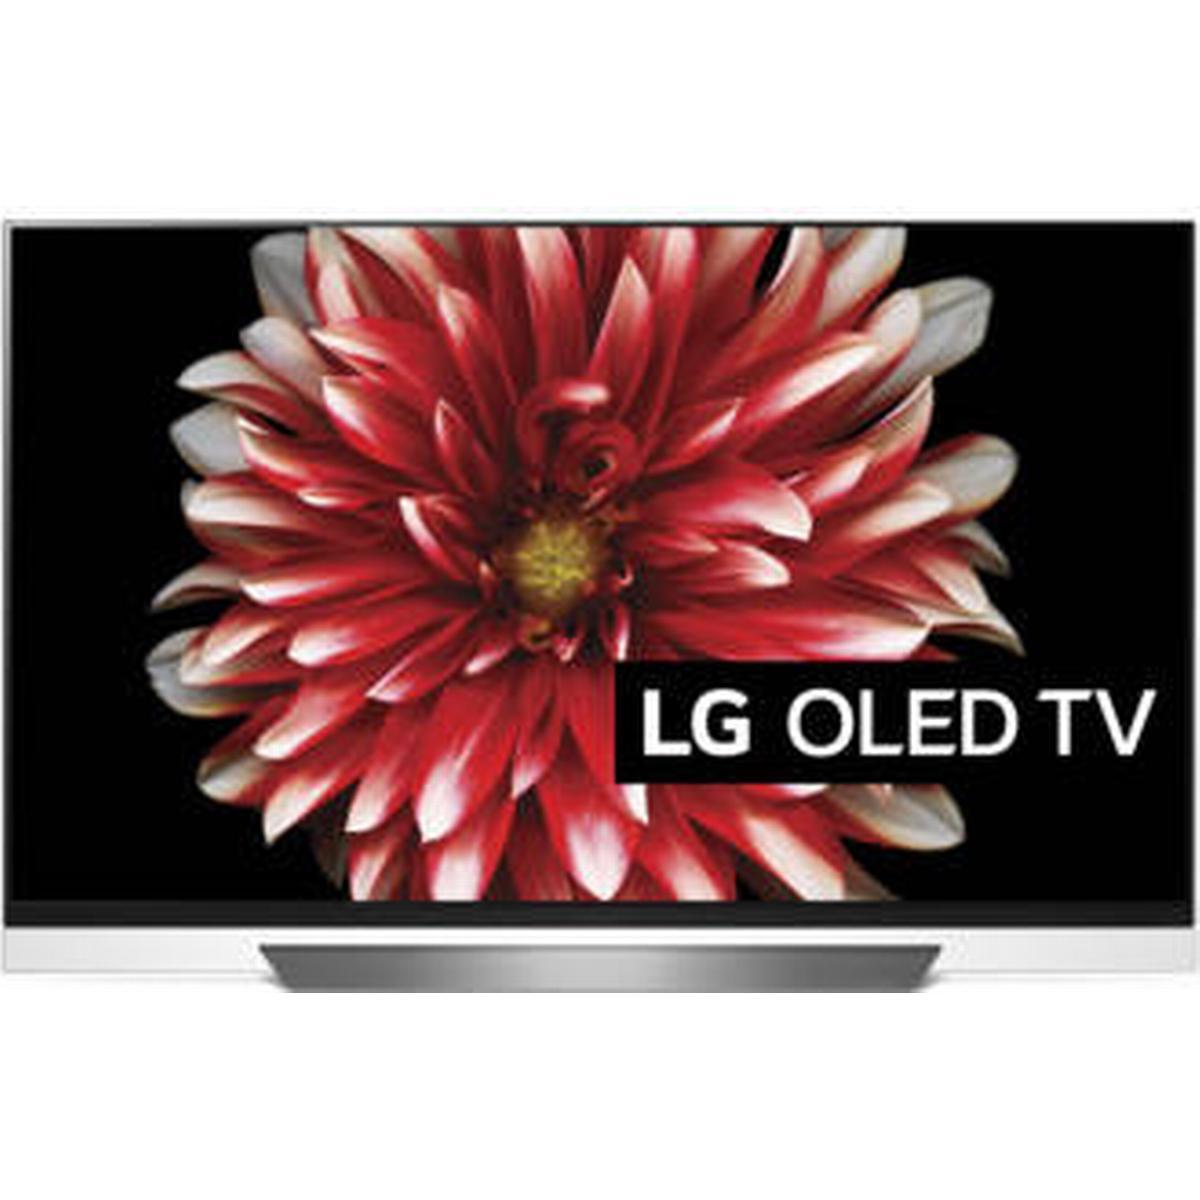 Splinternye LG TV - Sammenlign priser på LG fladskærm hos PriceRunner LN-79